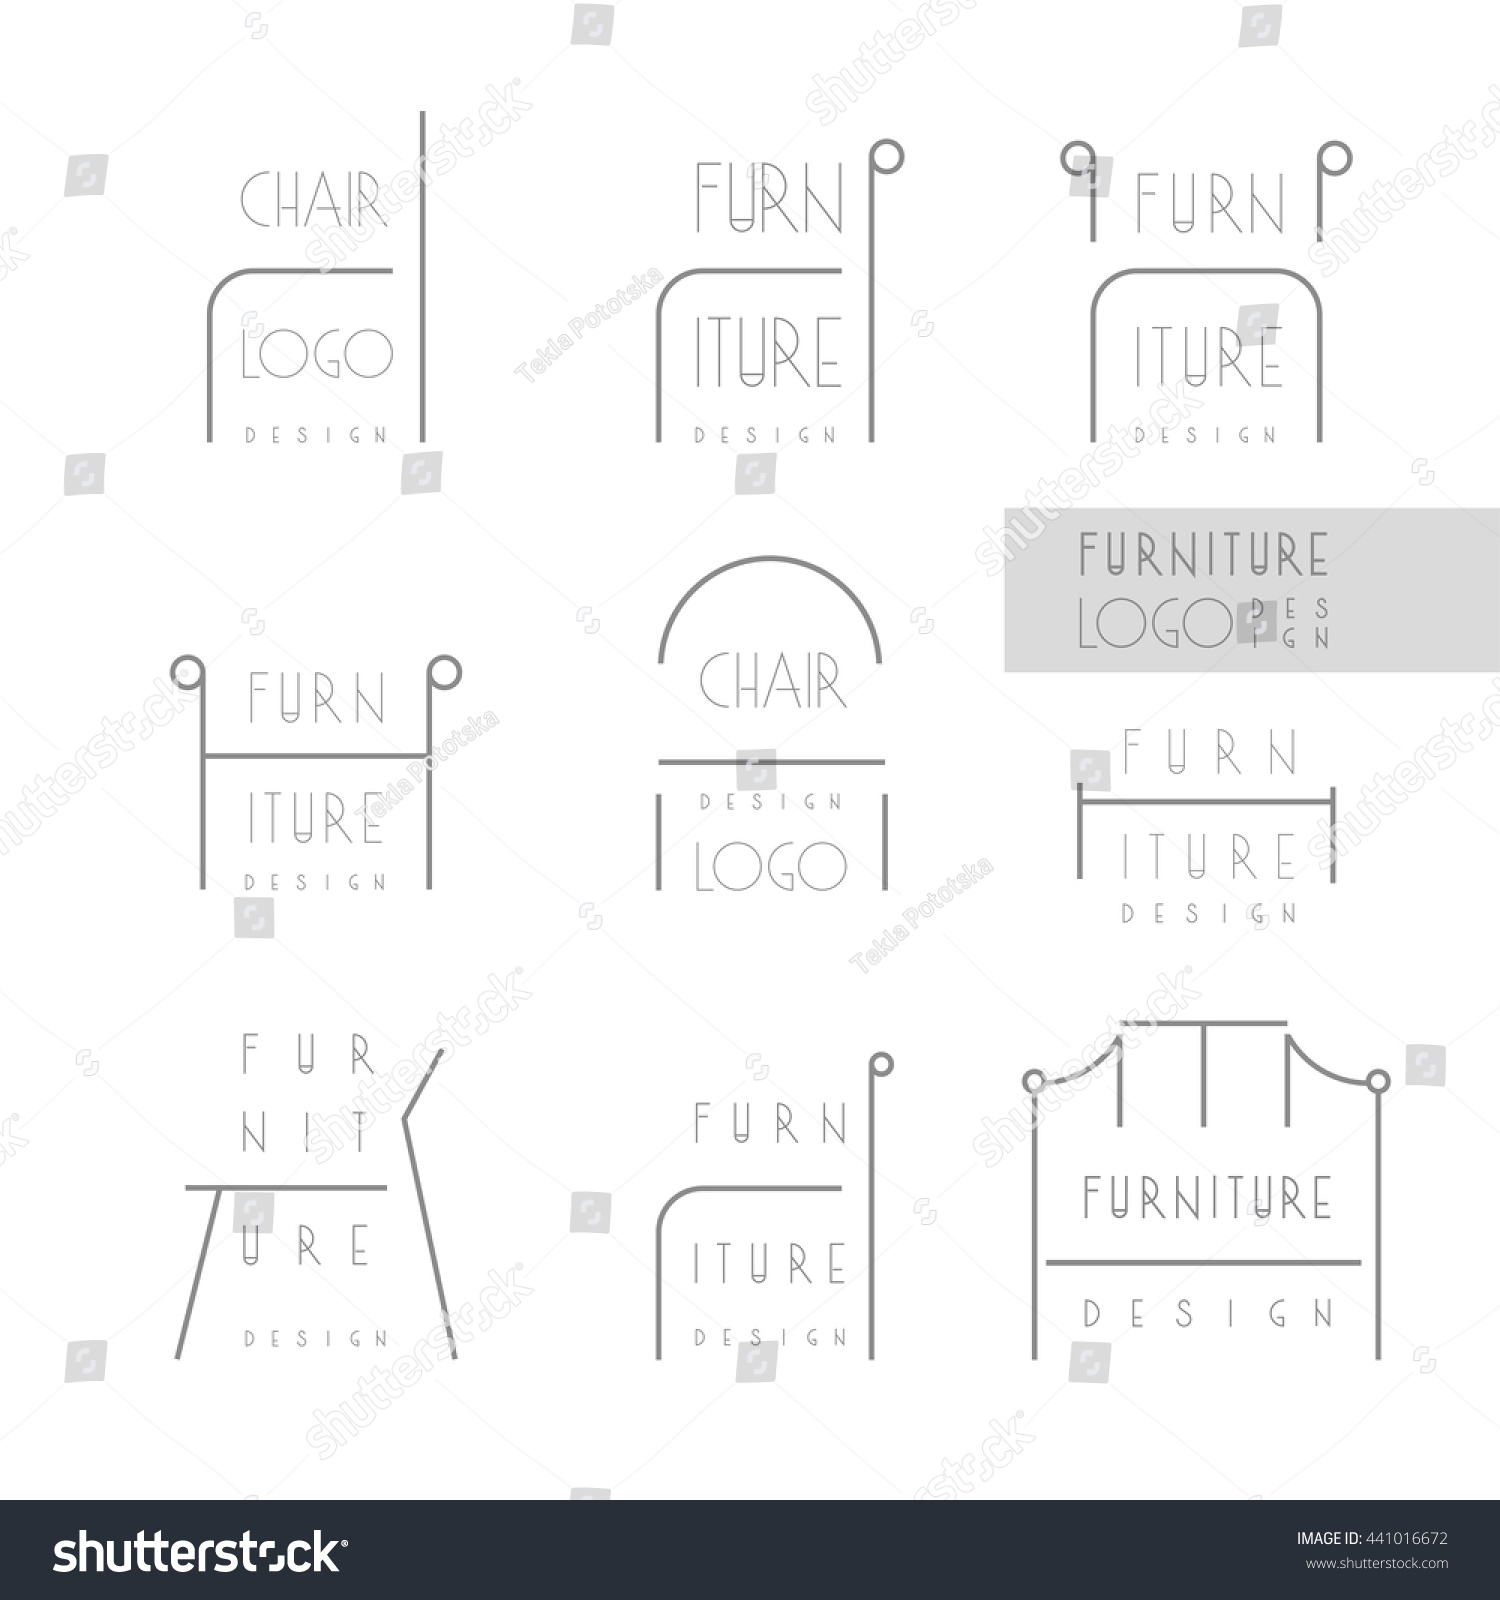 Interior Designer Brand Identity Furniture Design Stock Vector 441016672 Shutterstock